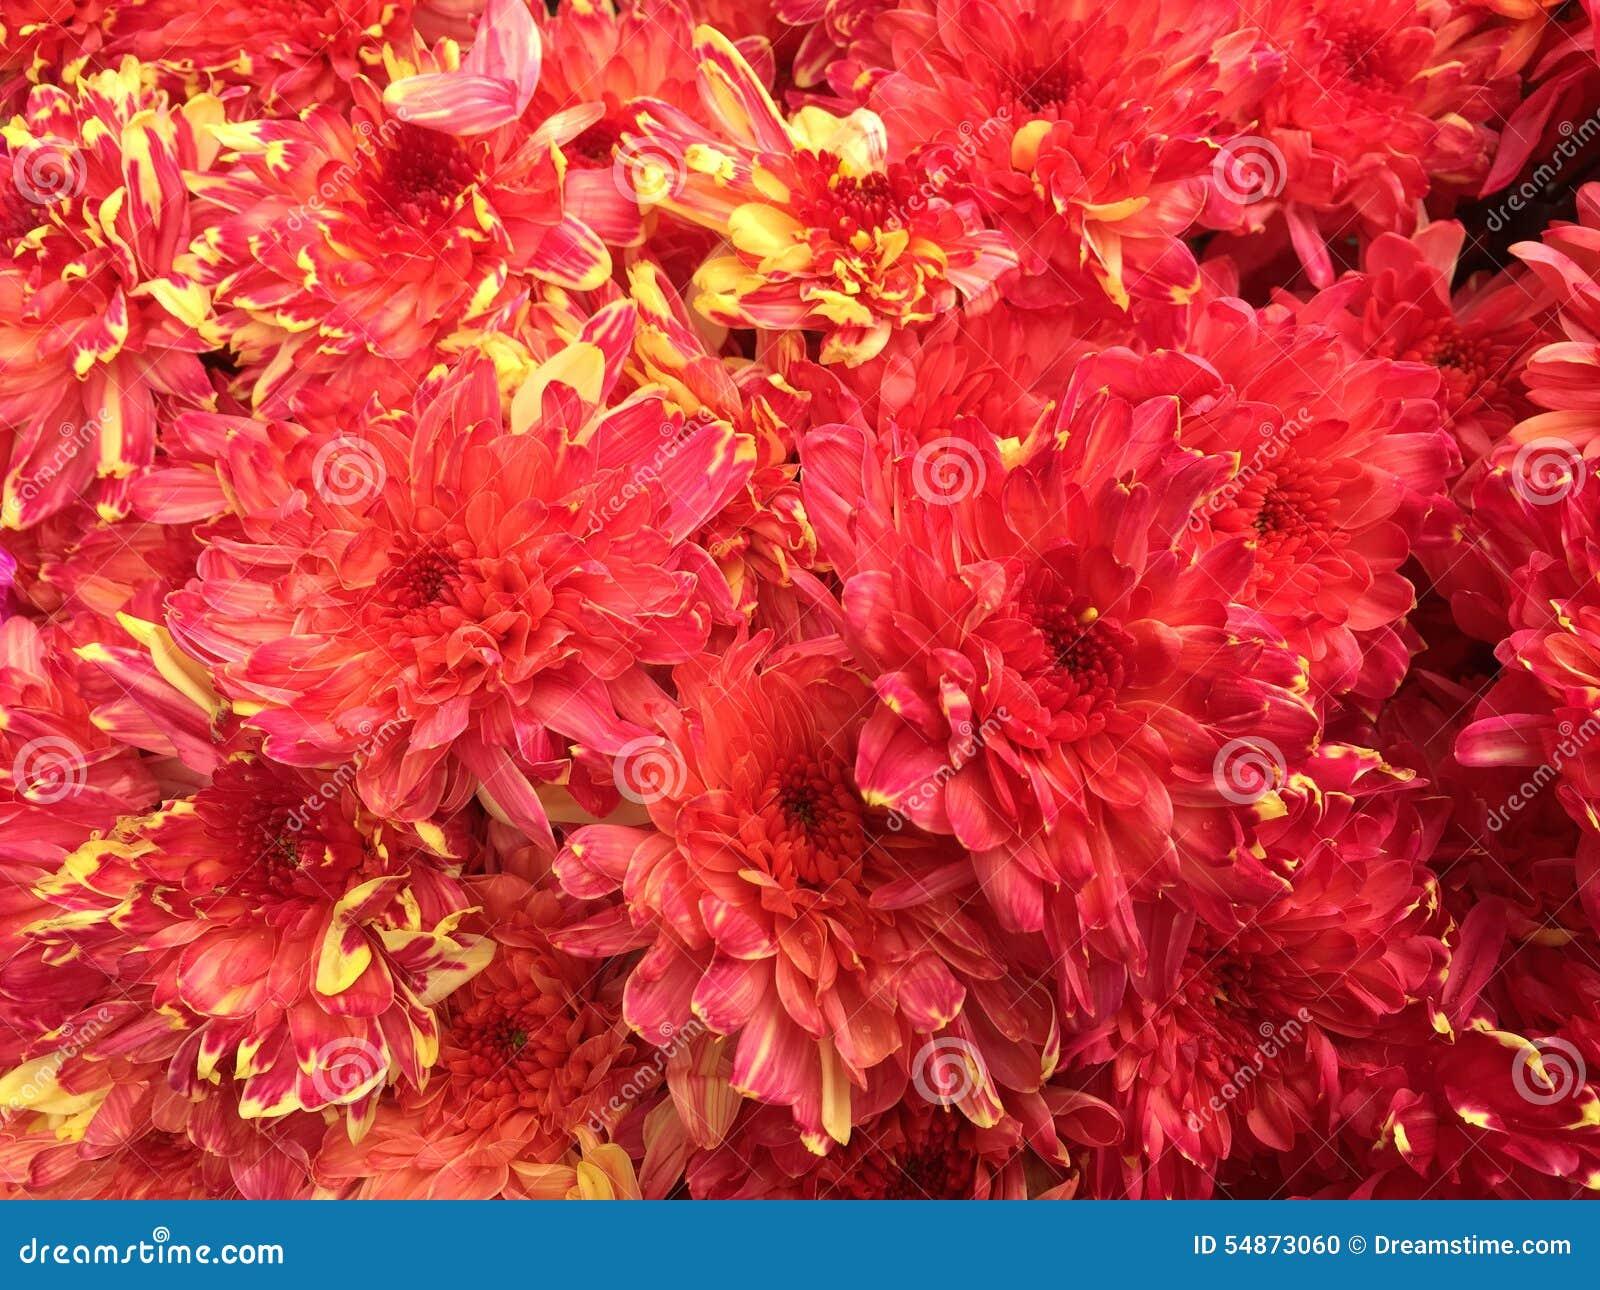 Malaysian Chrysanthemum Flowers Stock Photo - Image of flower ...